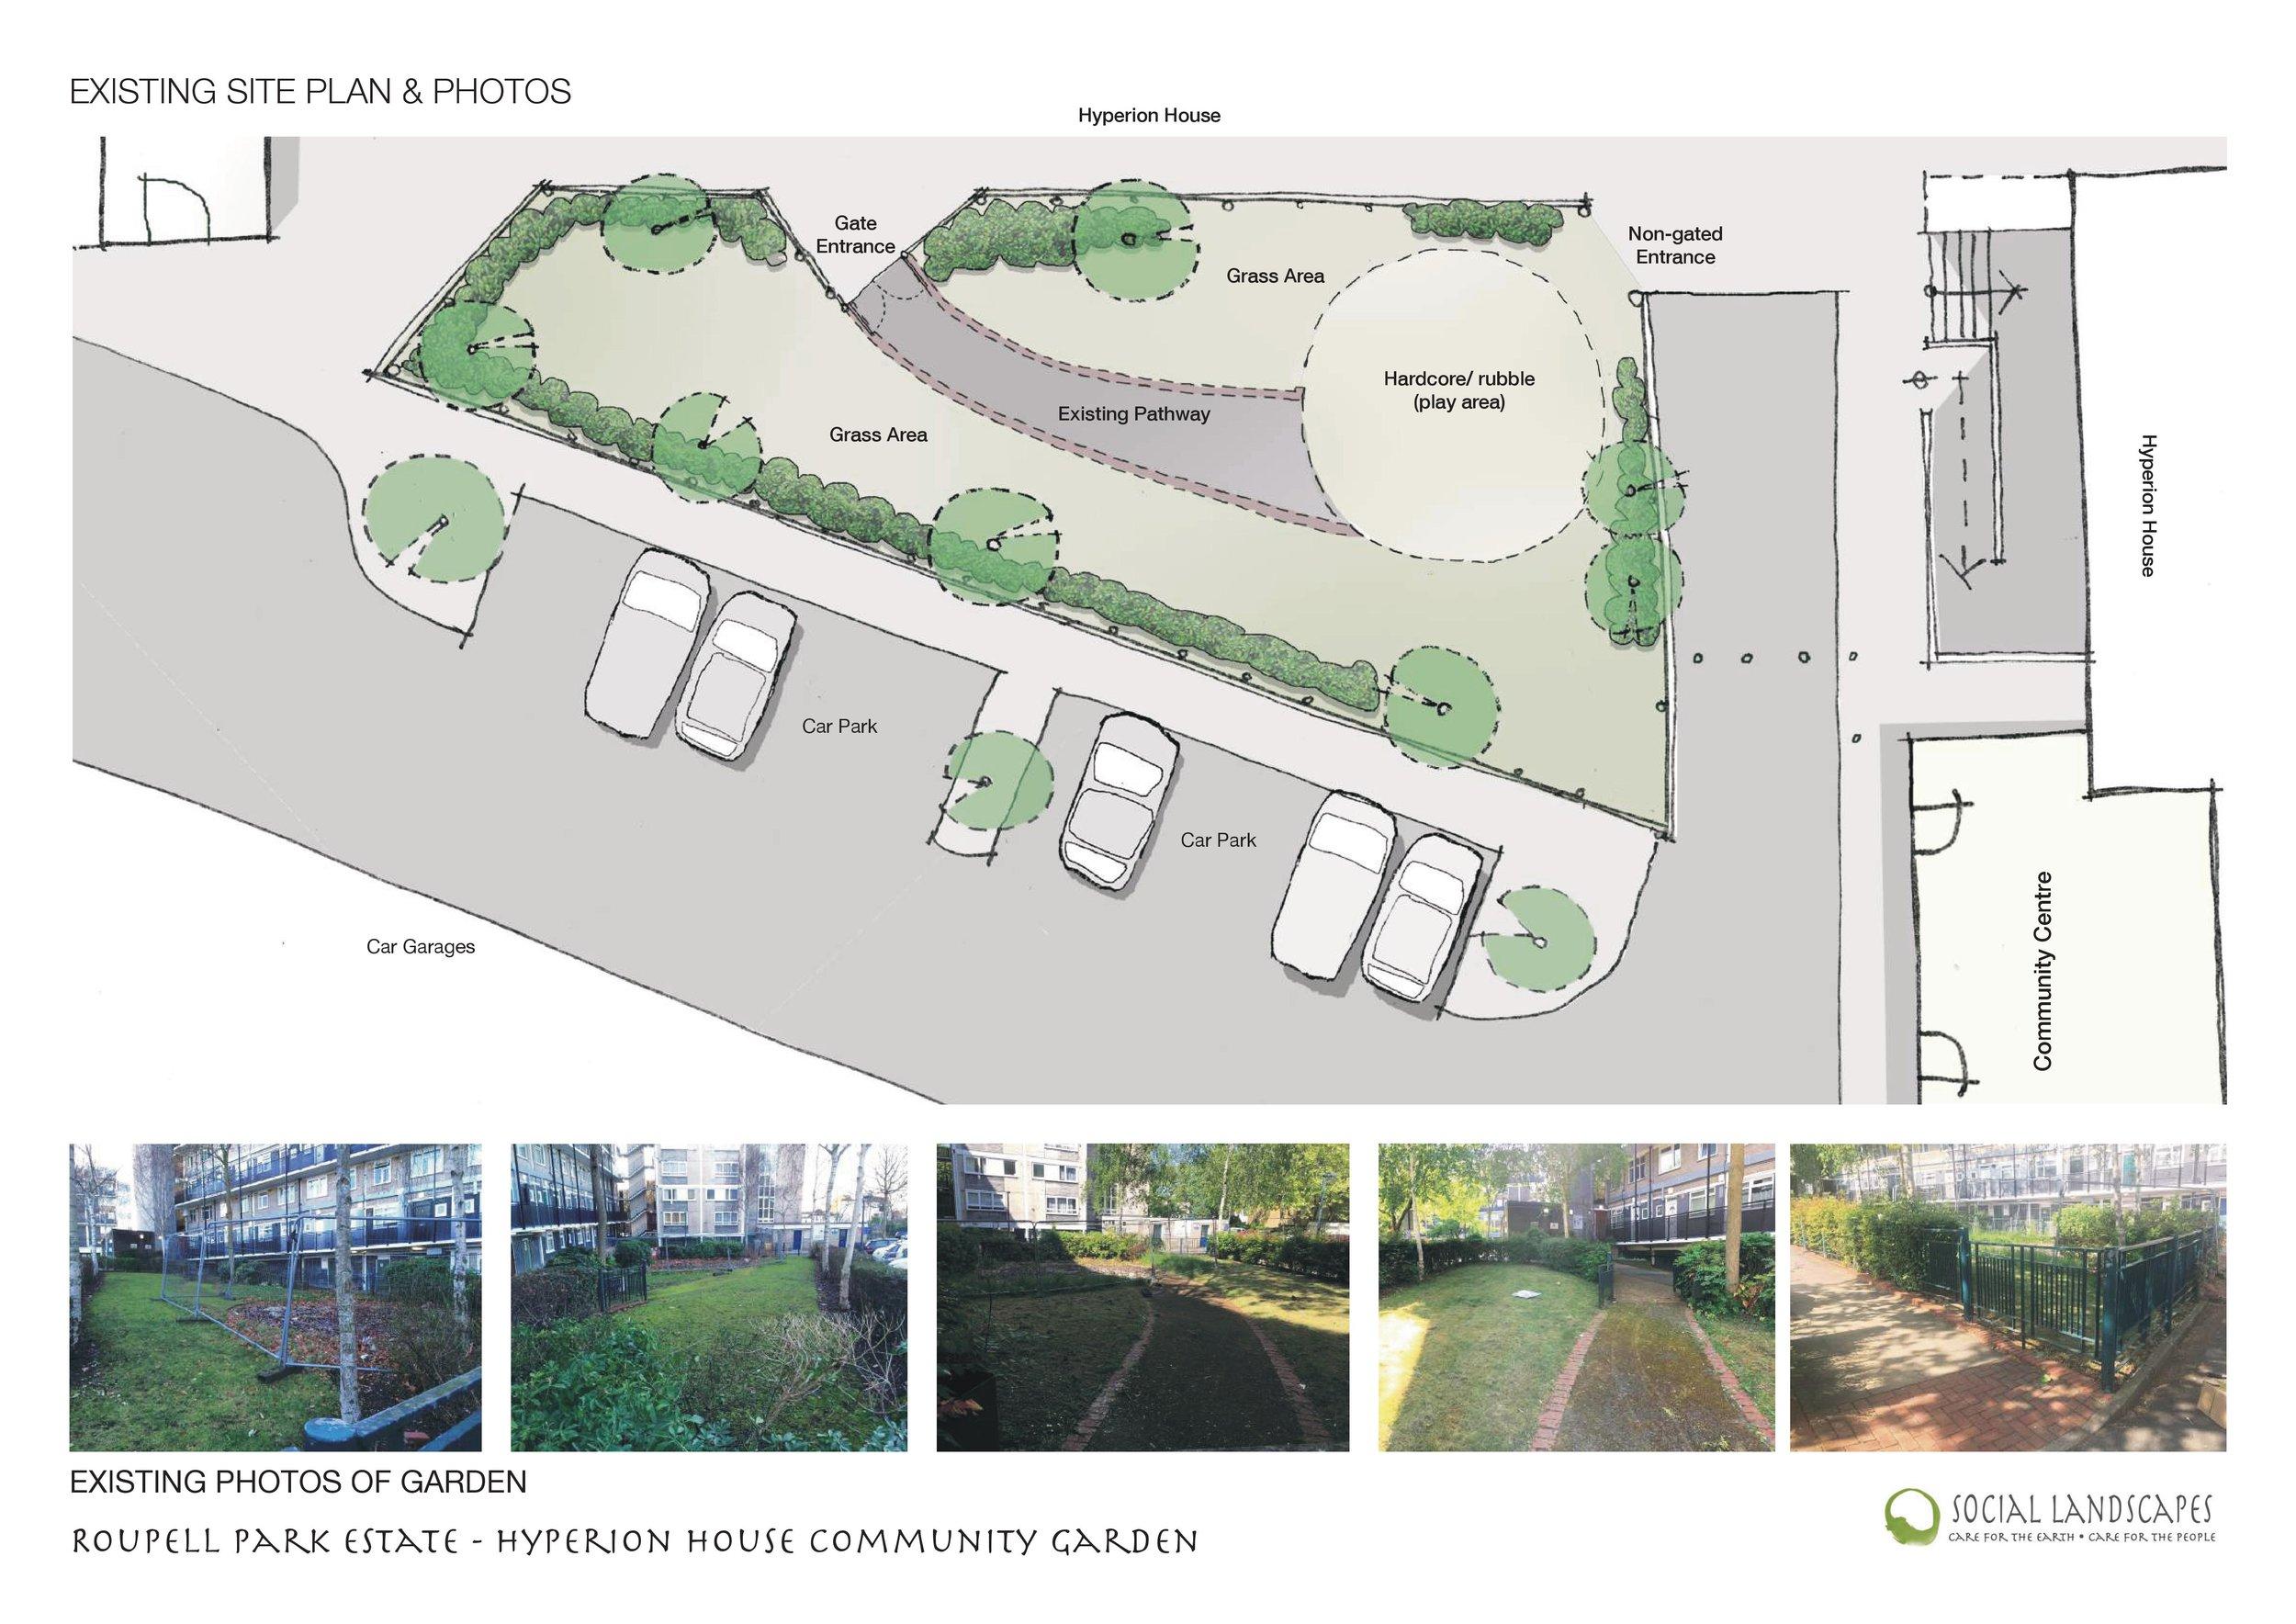 Community Design At Roupell Park Estate Social Landscapes